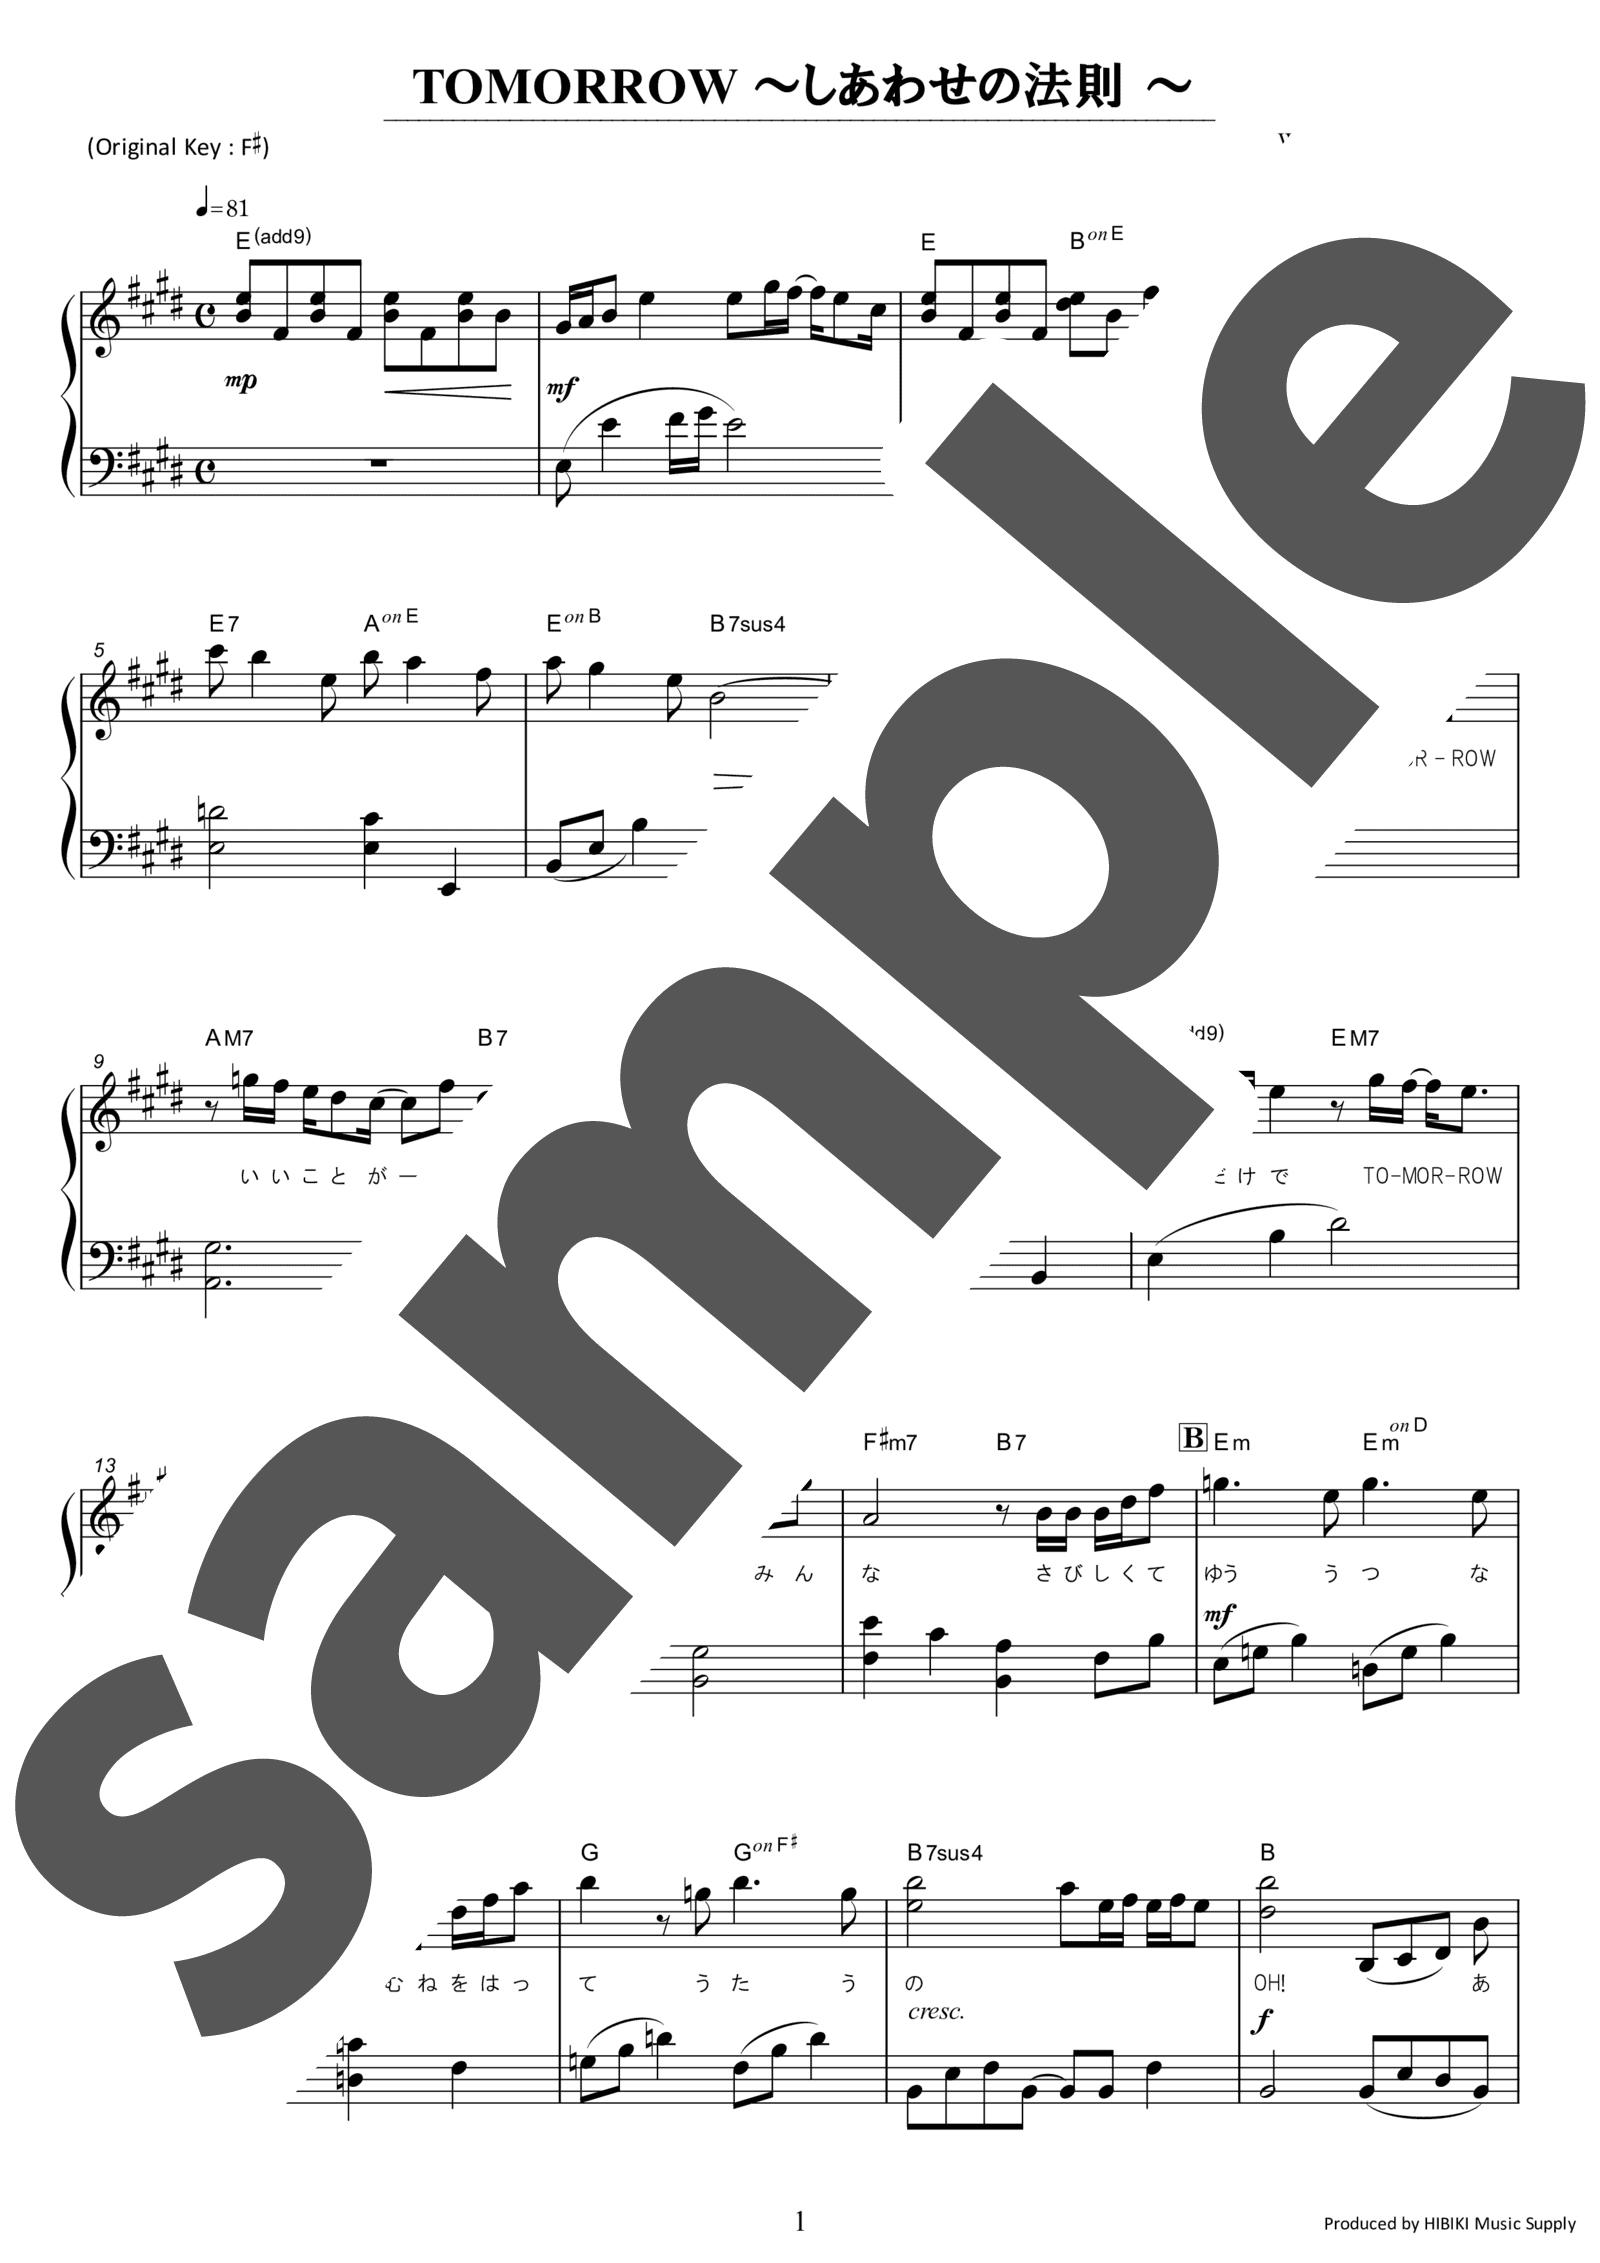 「TOMORROW ~しあわせの法則~」のサンプル楽譜